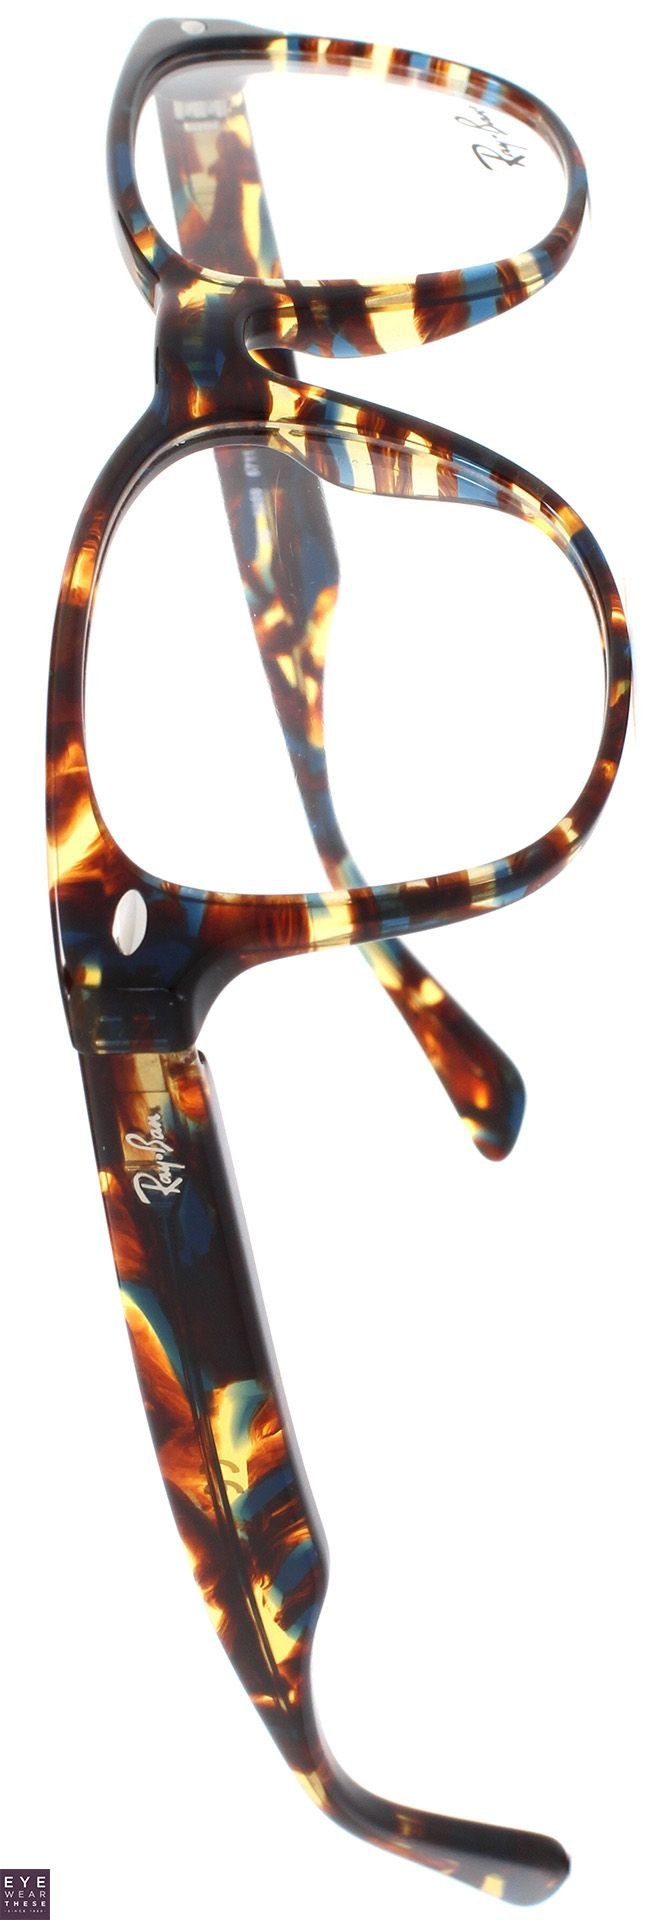 Ray-Ban rectangular prescription glasses for men | EyeWearThese | #eyewear #rayban #glasses #optical